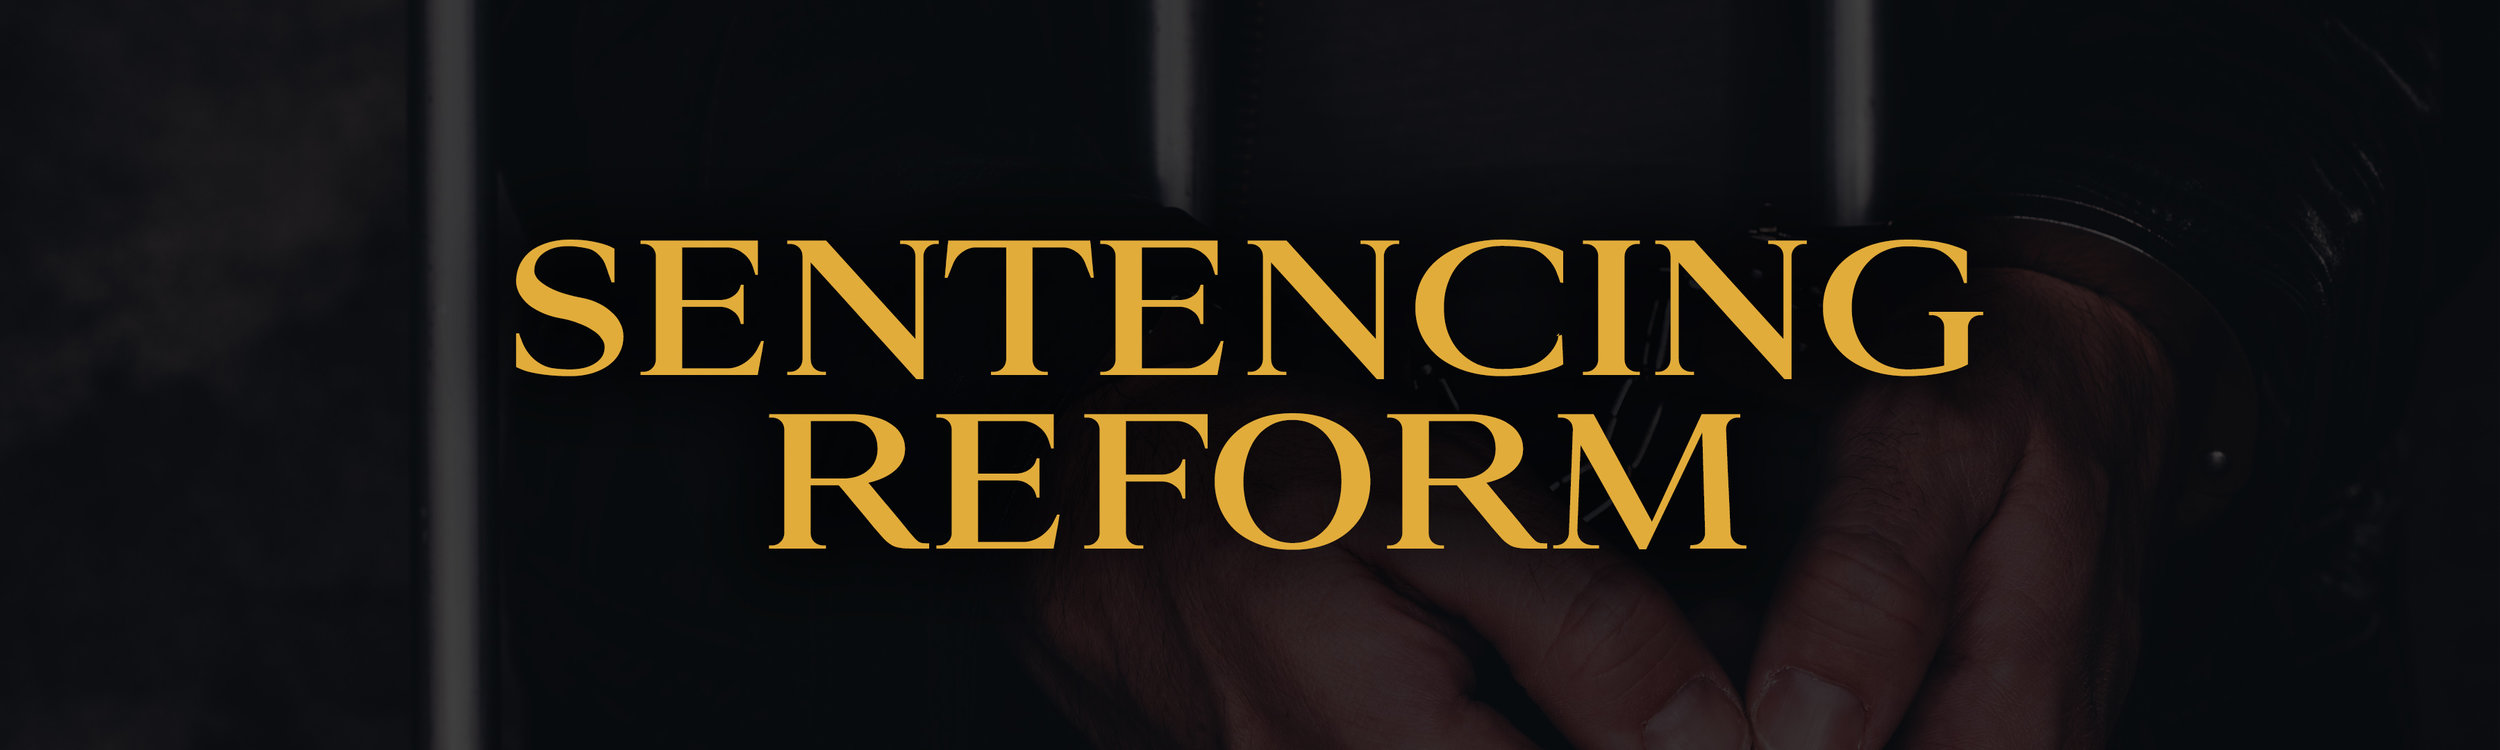 banner_sentencing.jpg